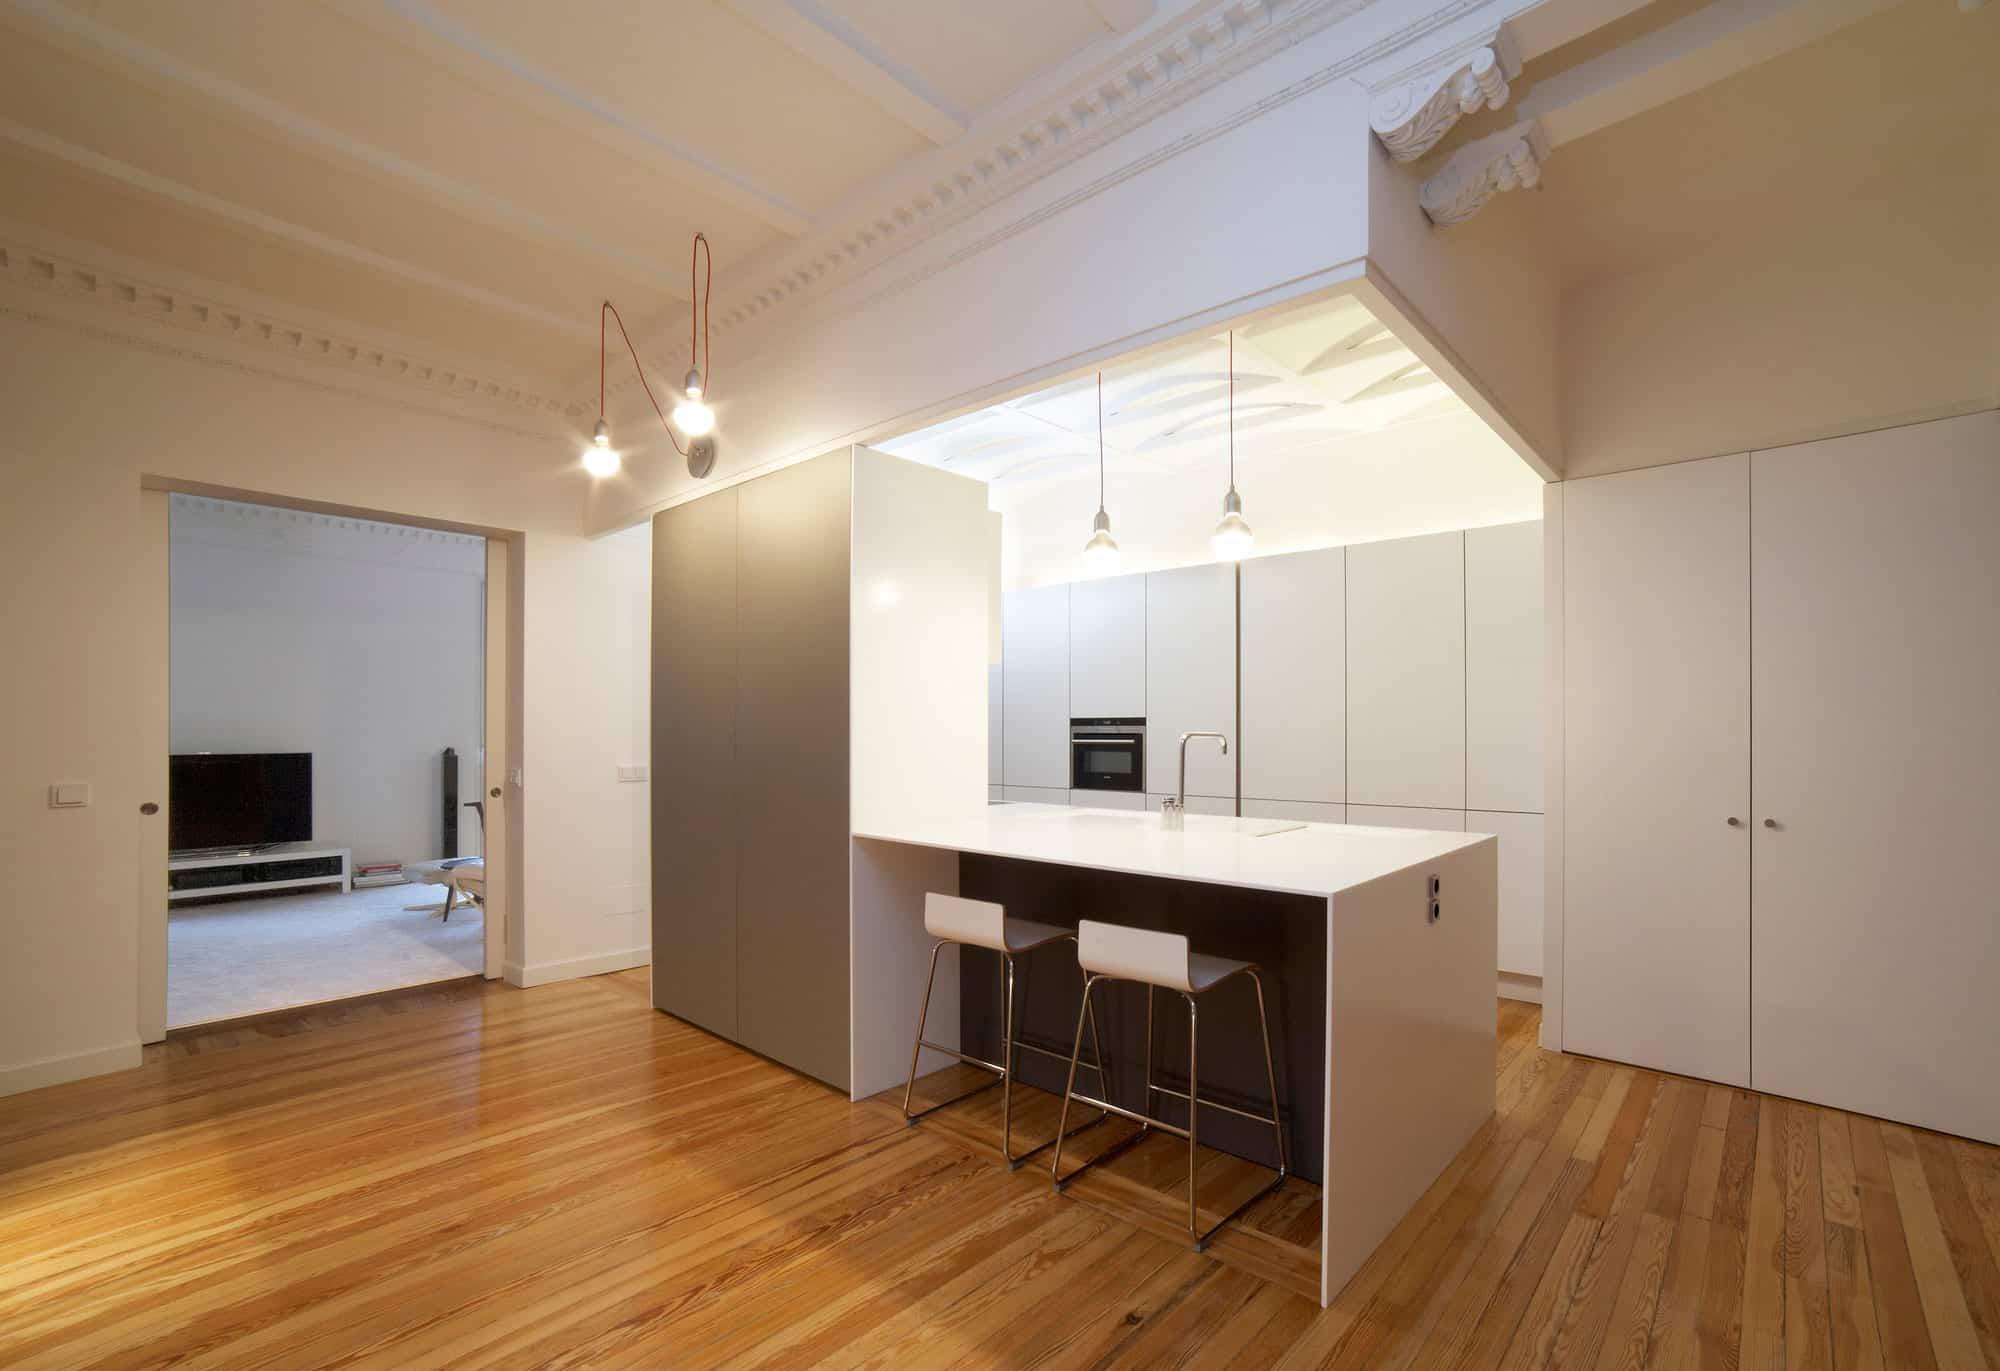 Ortega y Gasset Home by Beriot, Bernardini Arquitectos (4)